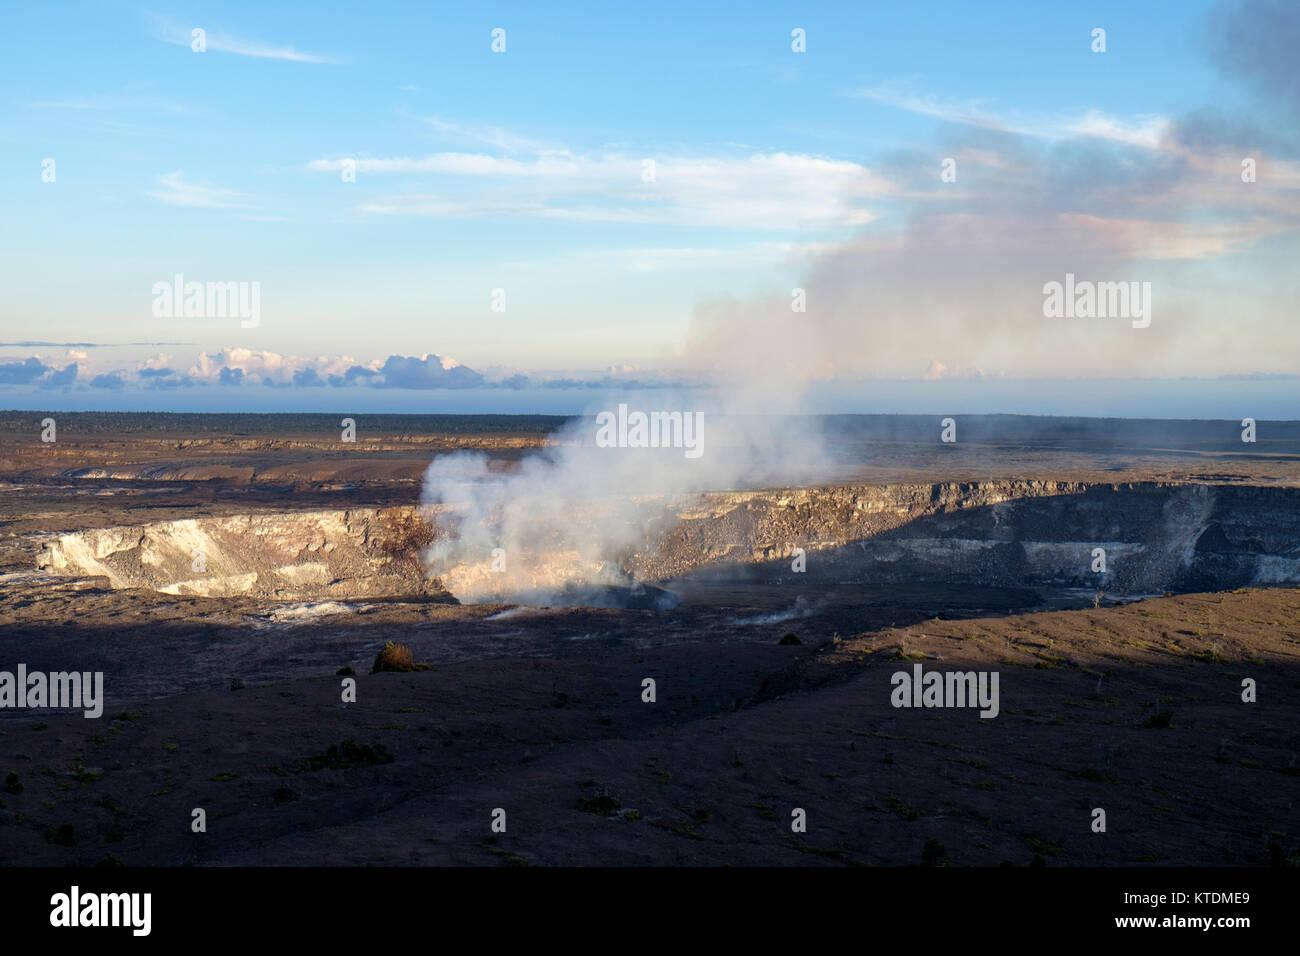 USA, Hawaii, Big Island, Hawaii Vulcanoes National Park, Halema'uma'u Krater - Stock Image